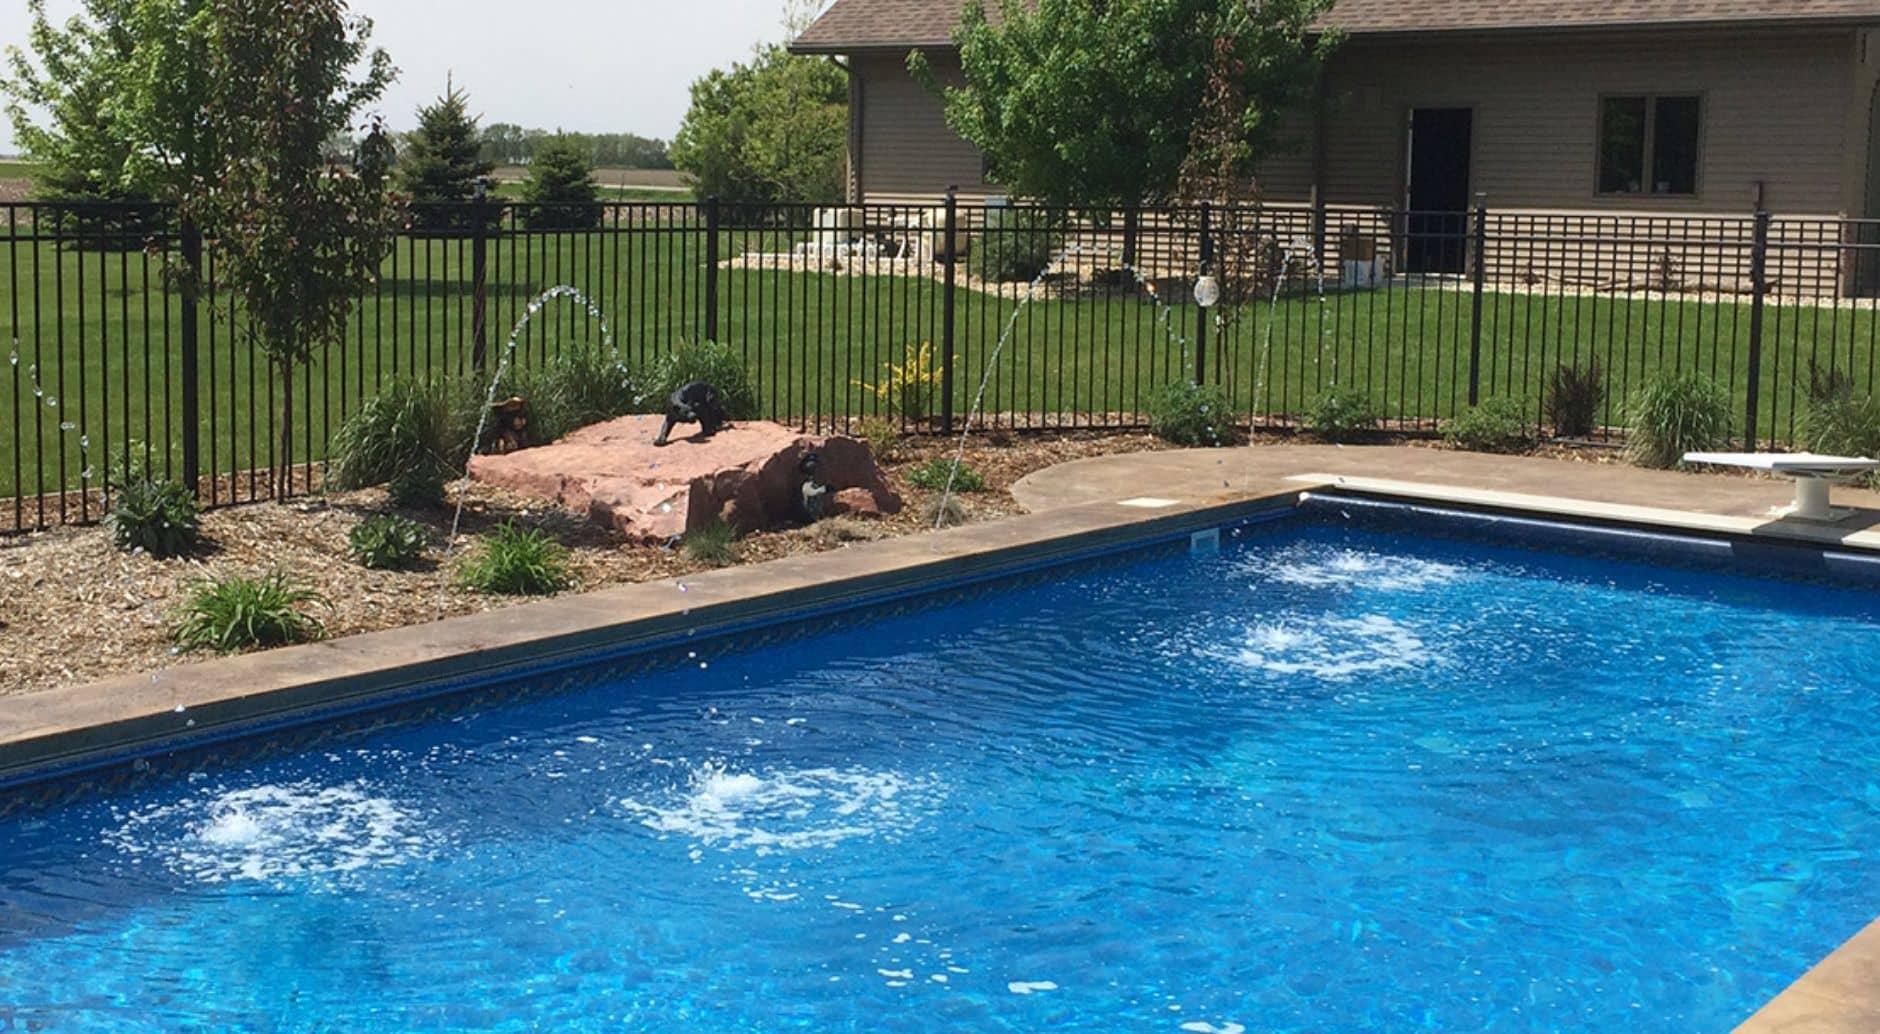 Home Marshall Spas Amp Pools Marshall Mn 507 532 2015